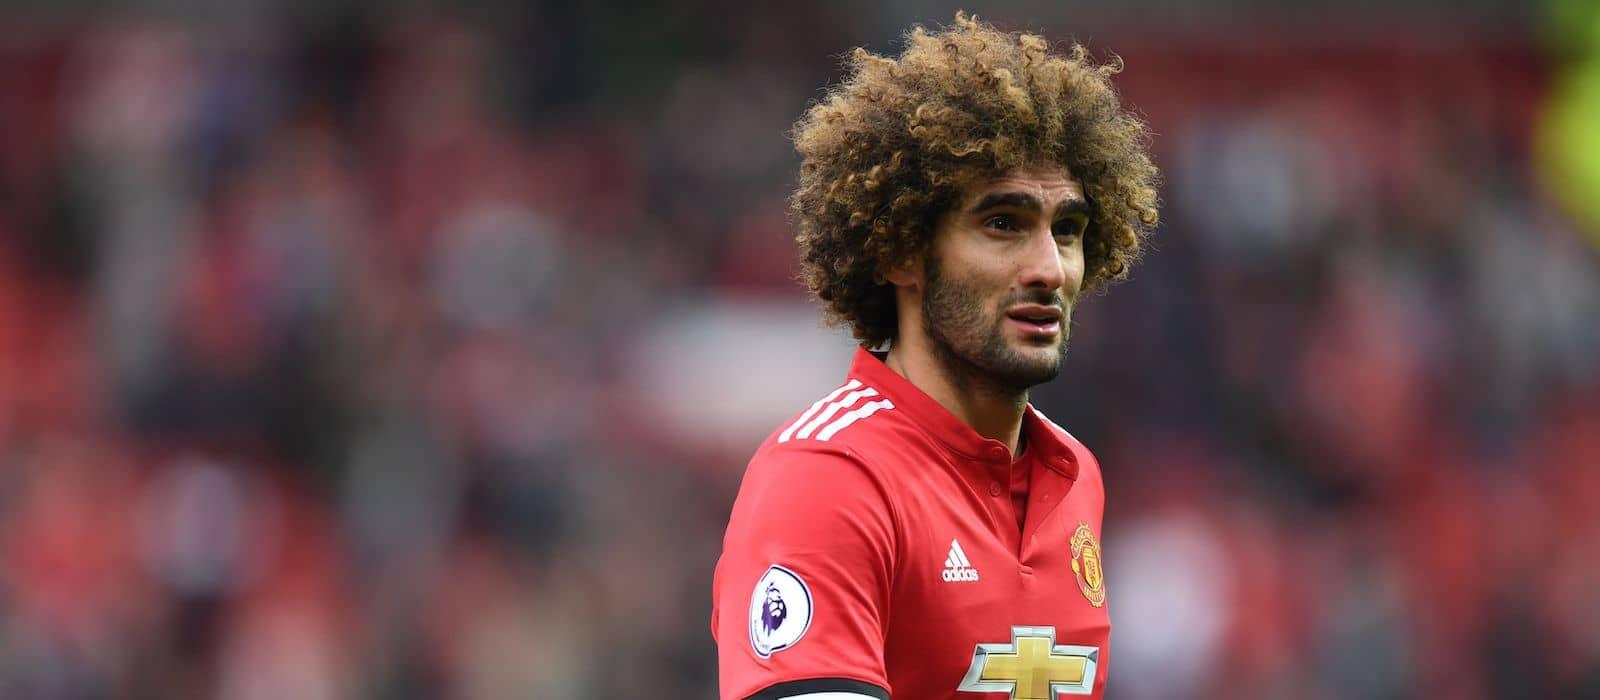 Roberto Martinez confirms Manchester United midfielder Marouane Fellaini has an injury worry